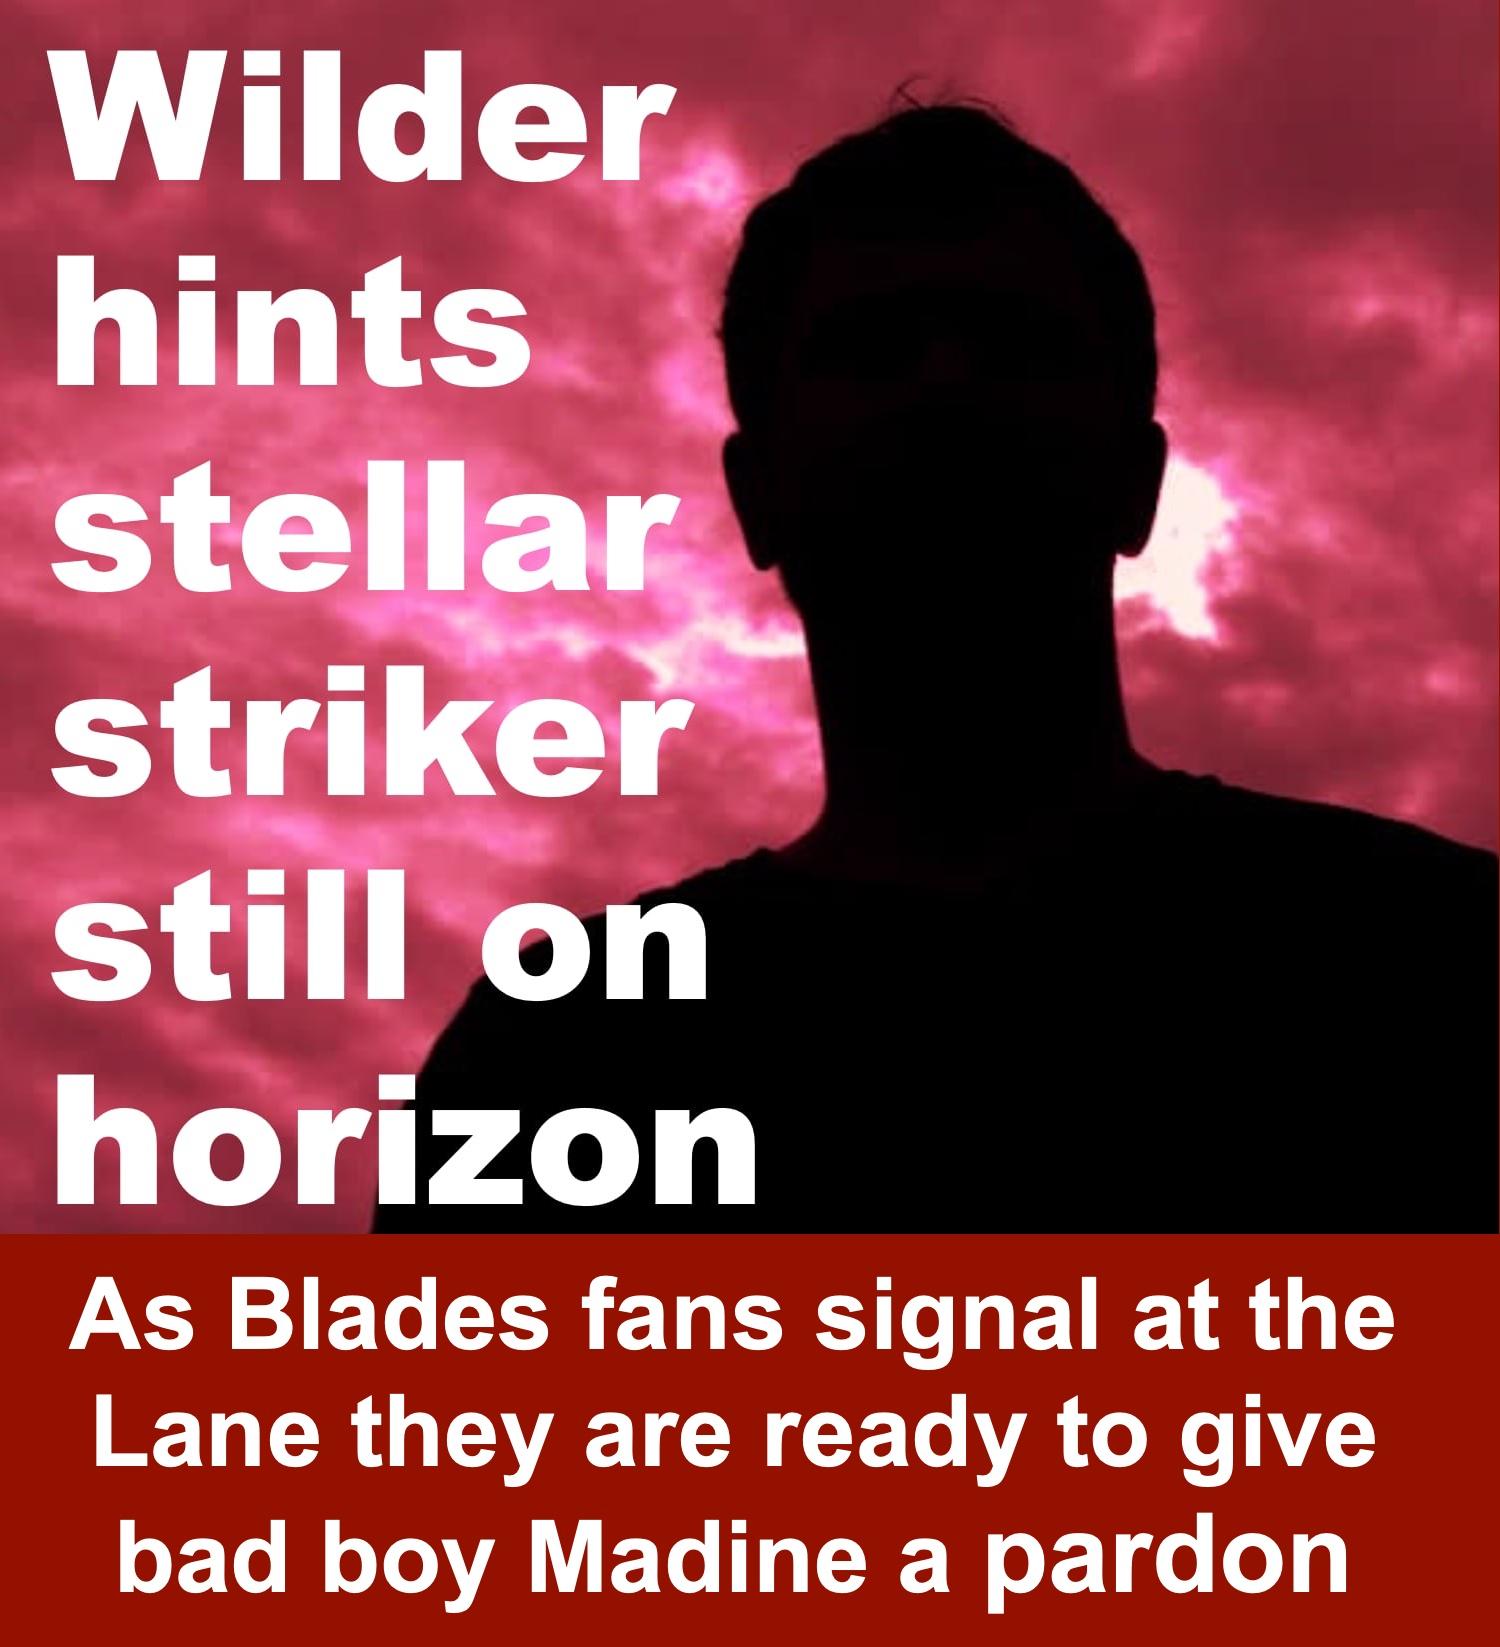 Sheffield United boss hints stellar striker is still on horizon for Blades at Bramall Lane